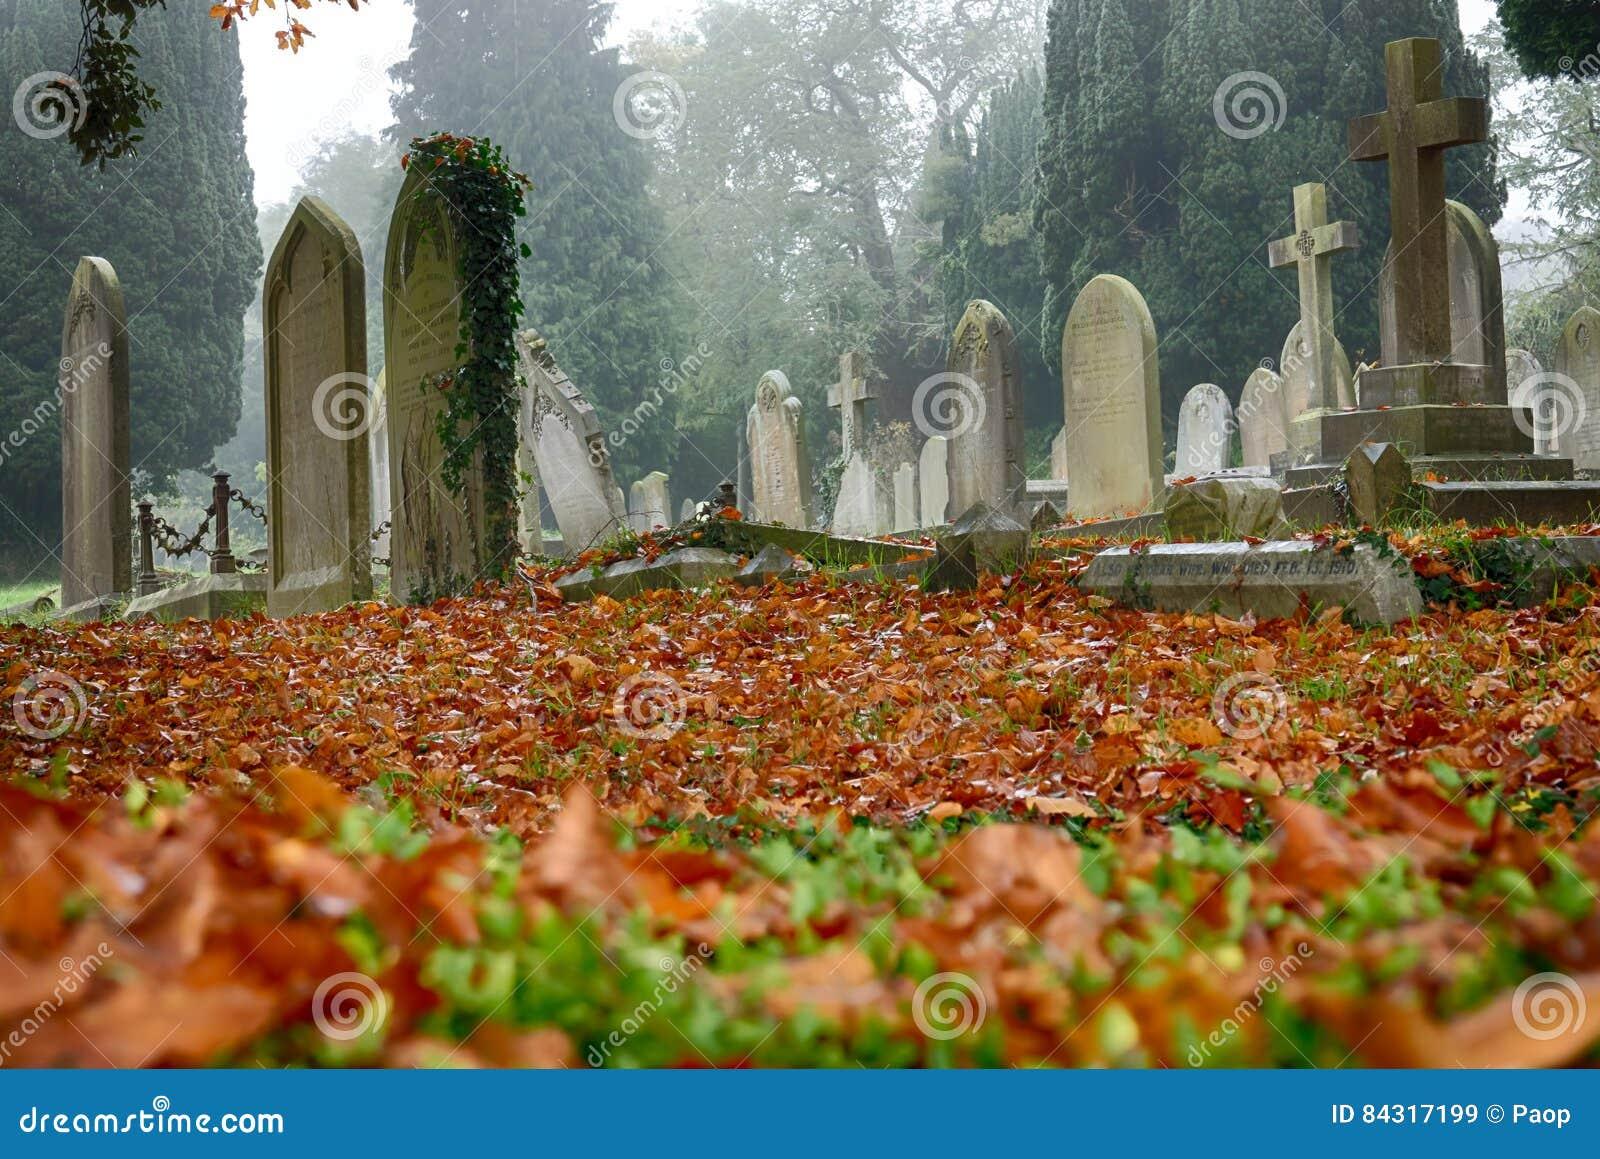 Cementery in autumn